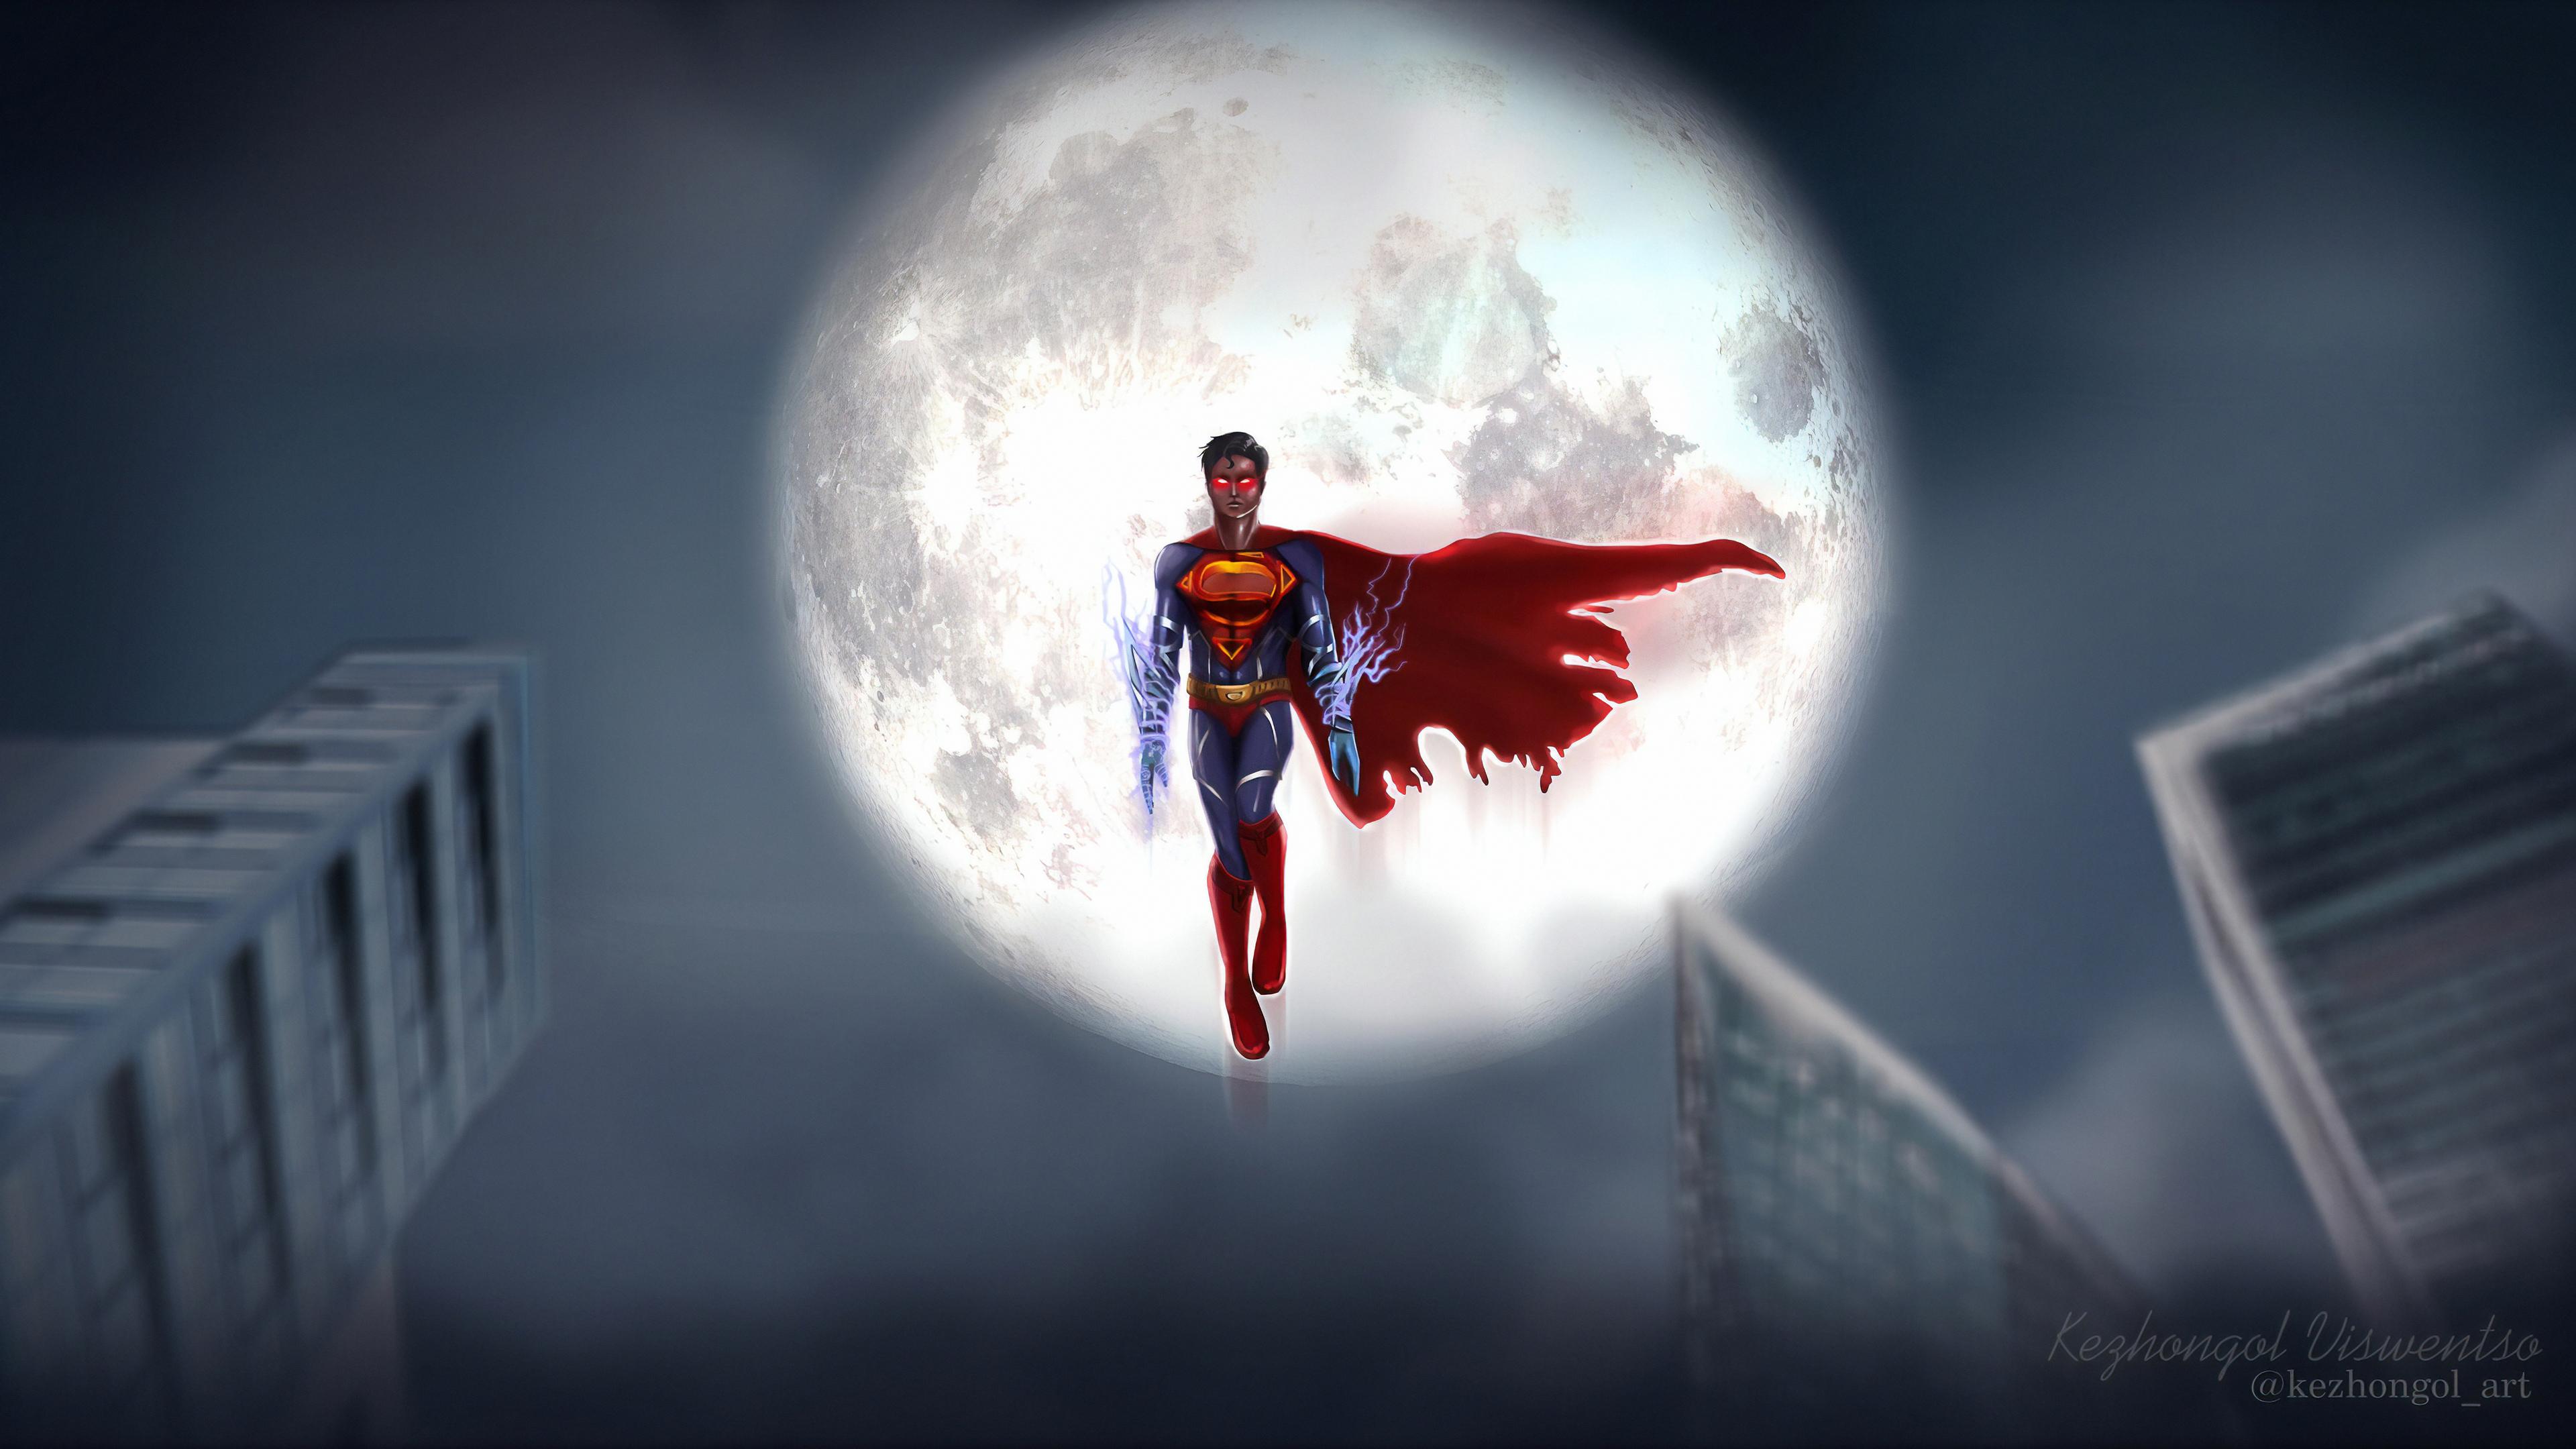 superman flying 1565053433 - Superman Flying - superman wallpapers, superheroes wallpapers, hd-wallpapers, digital art wallpapers, artwork wallpapers, artstation wallpapers, 4k-wallpapers